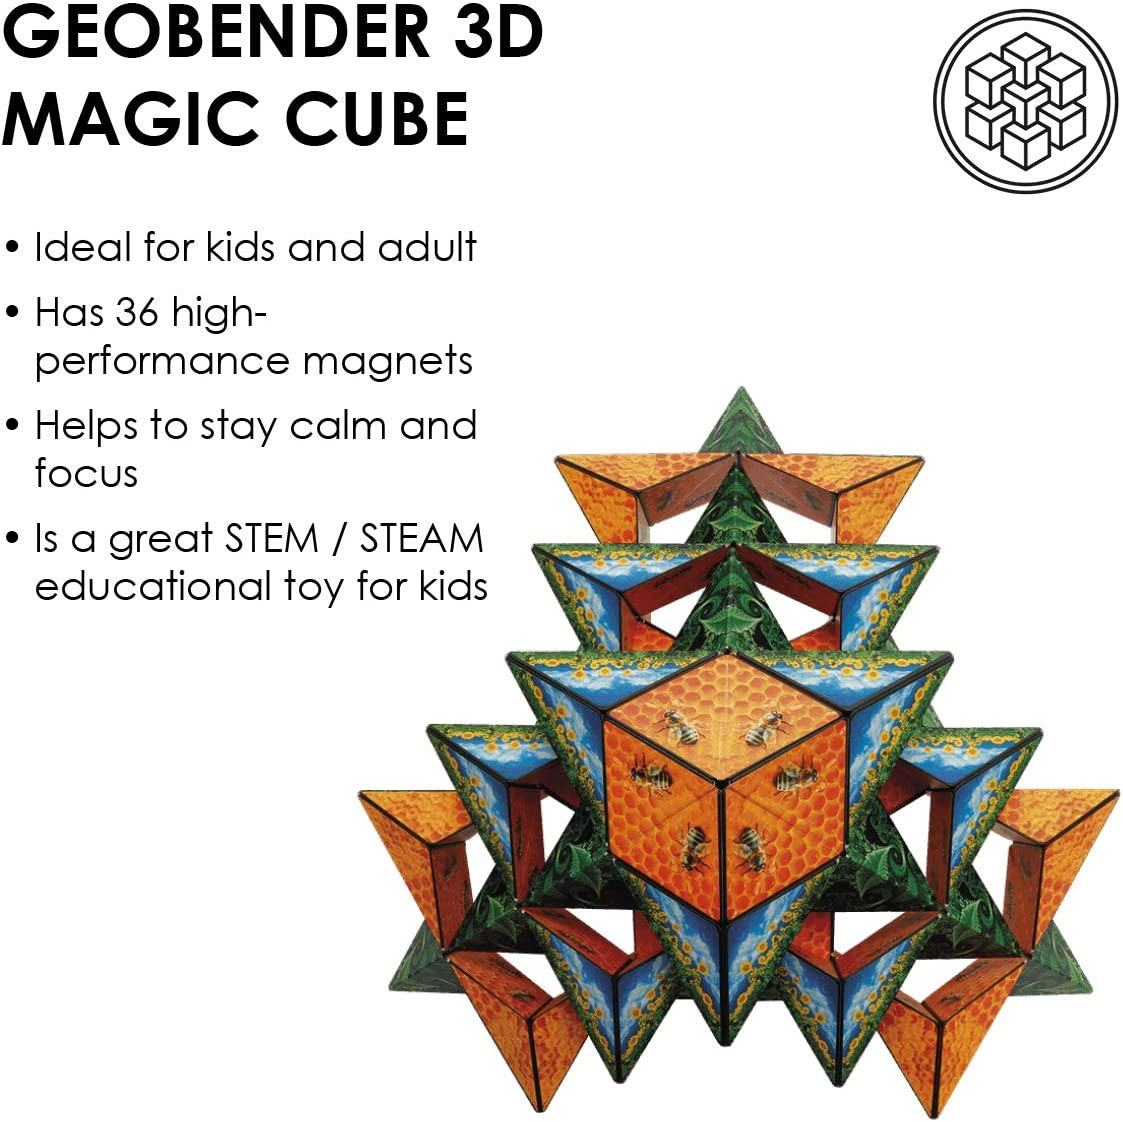 GeoBender GBC-BEES-1ER Bees Cube